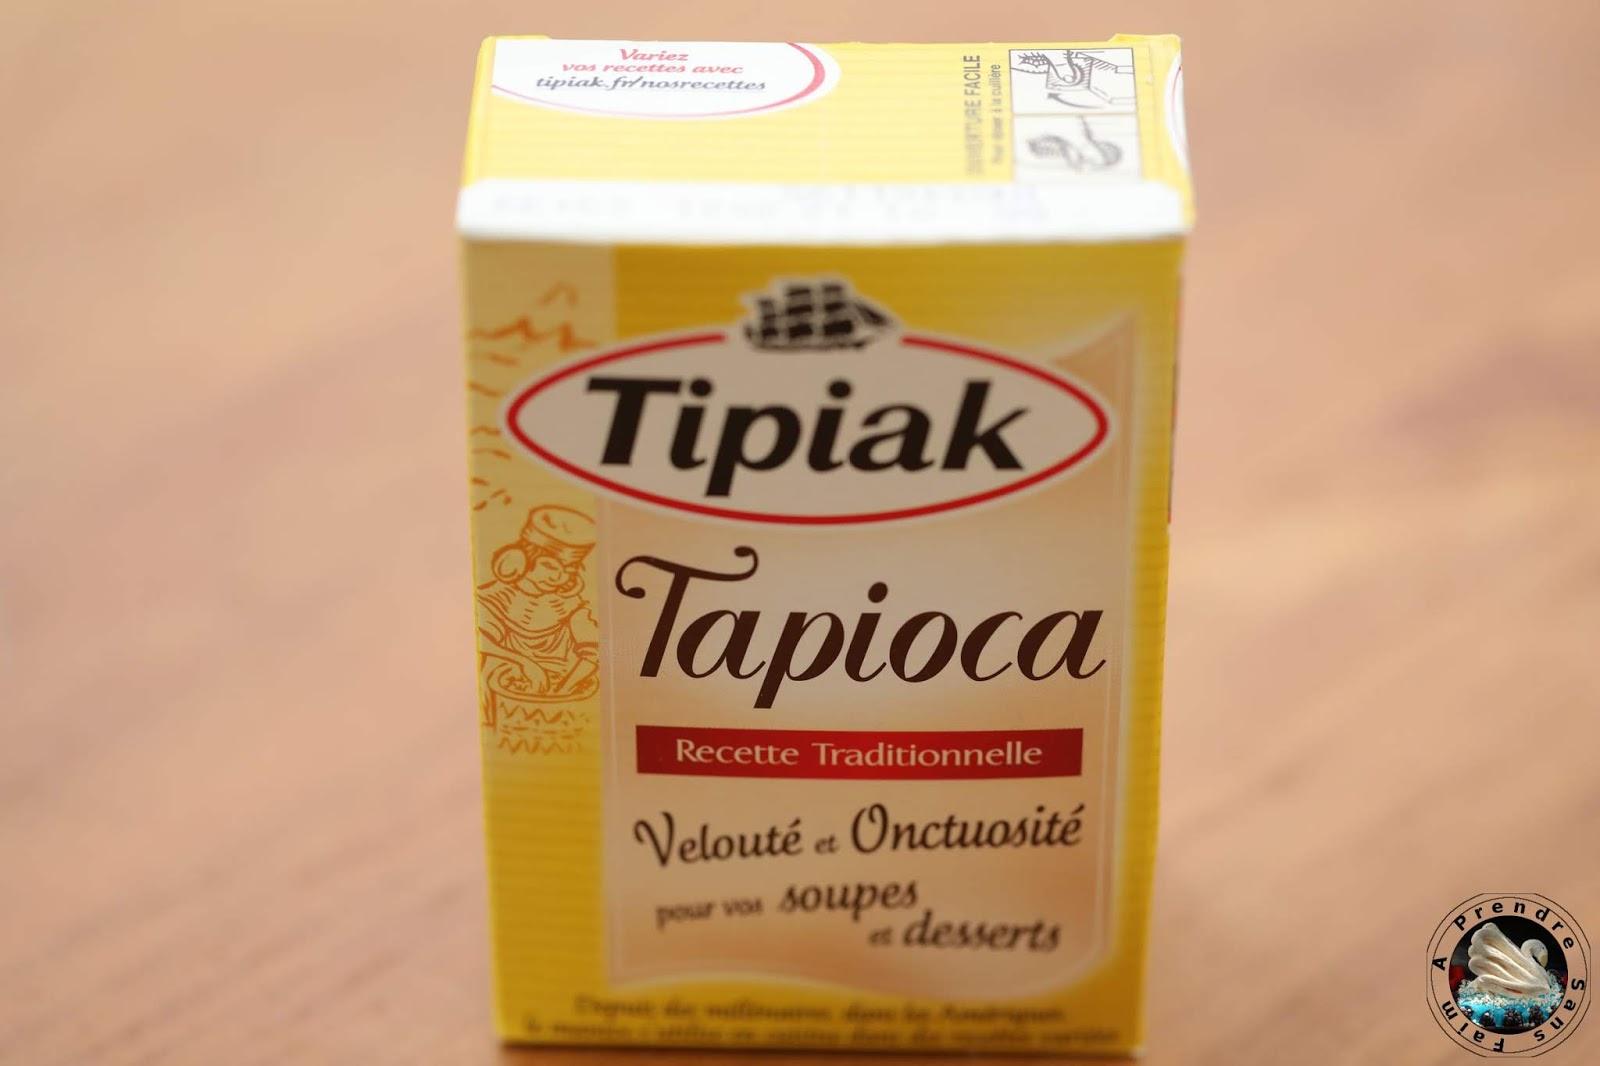 Crème dessert tapioca Nutella